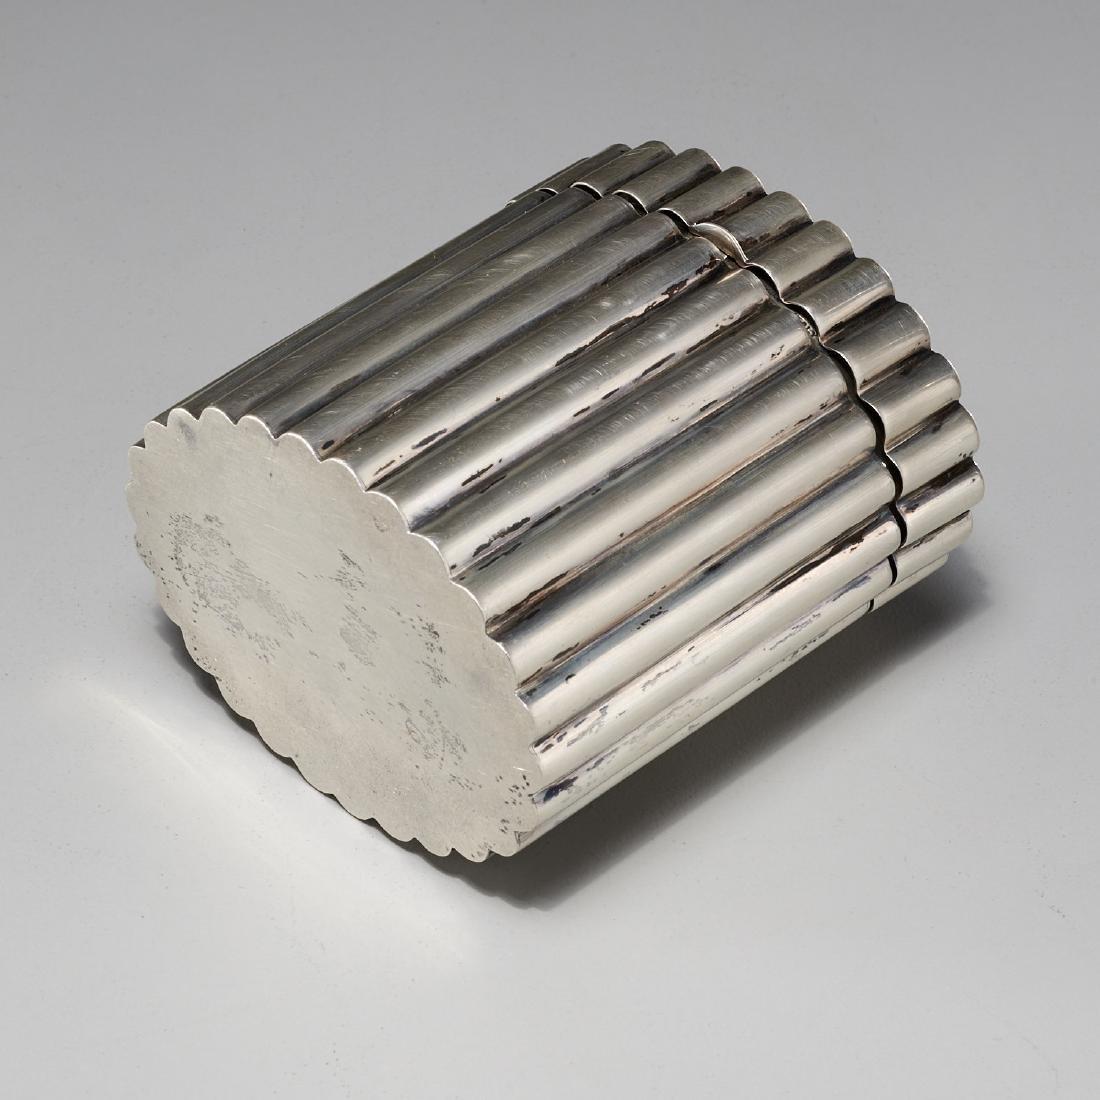 Tiffany & Co. Art Deco silver lidded box - 6